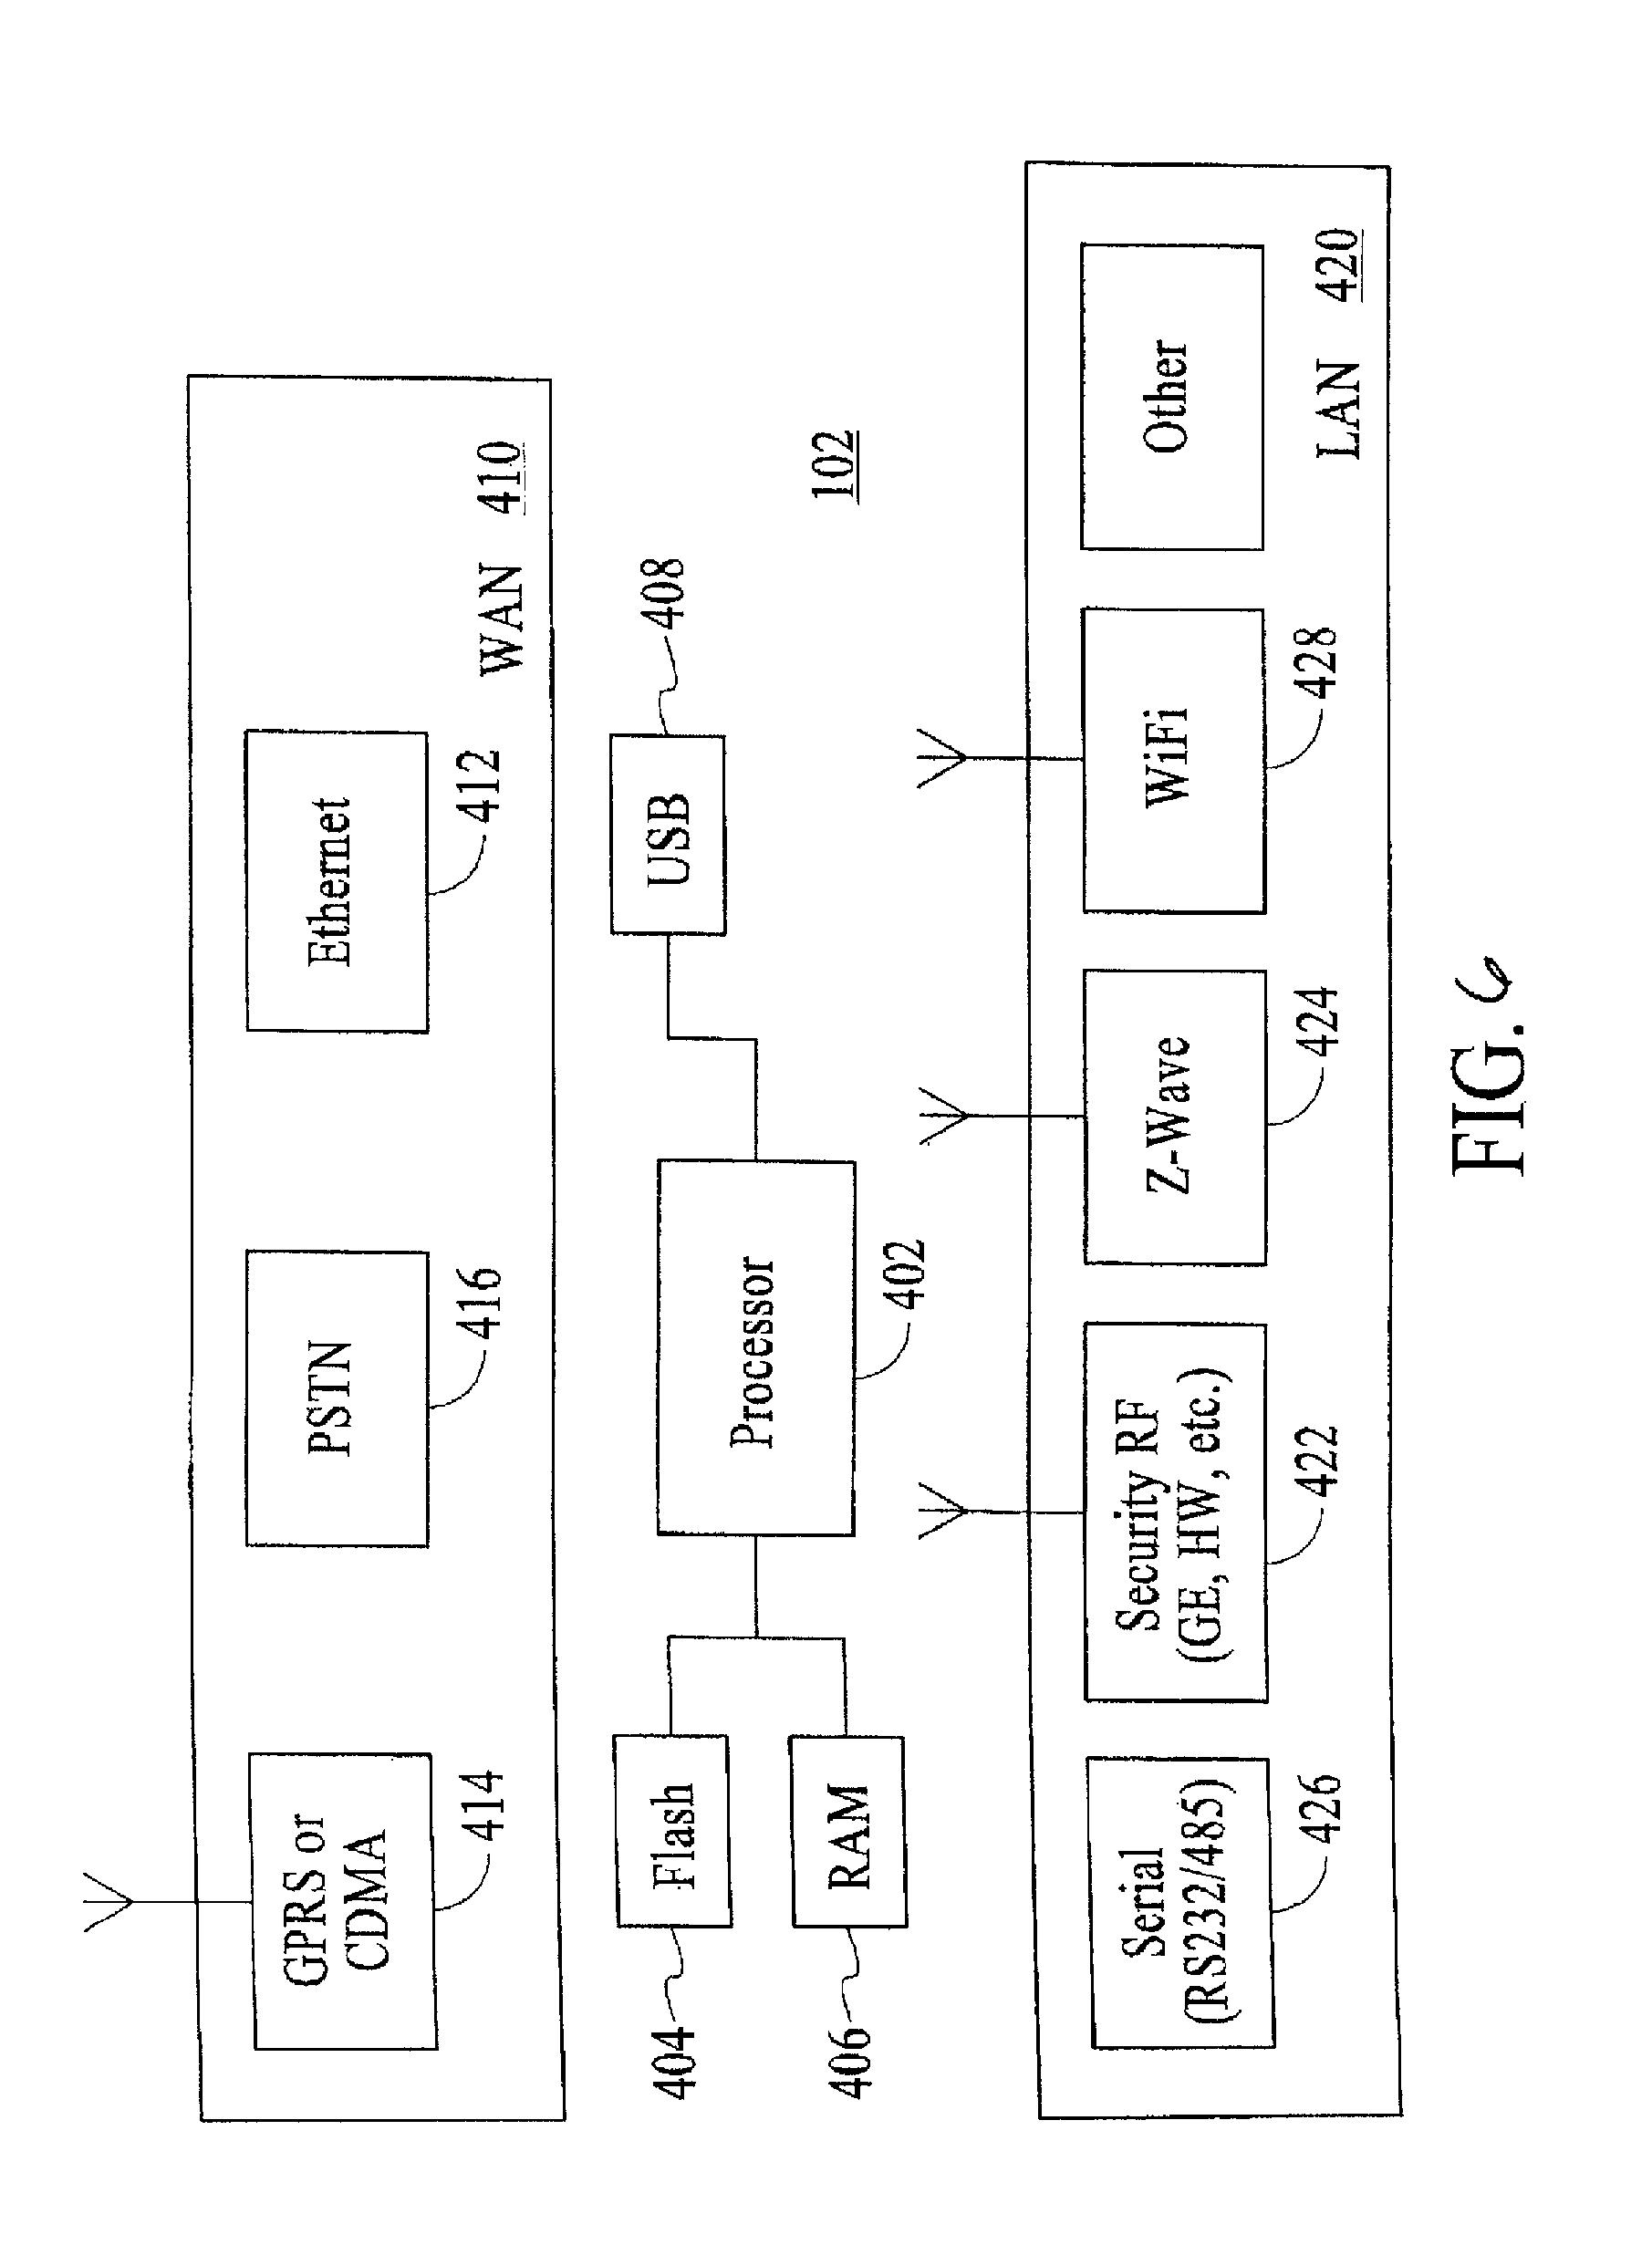 Patent US 10,051,078 B2